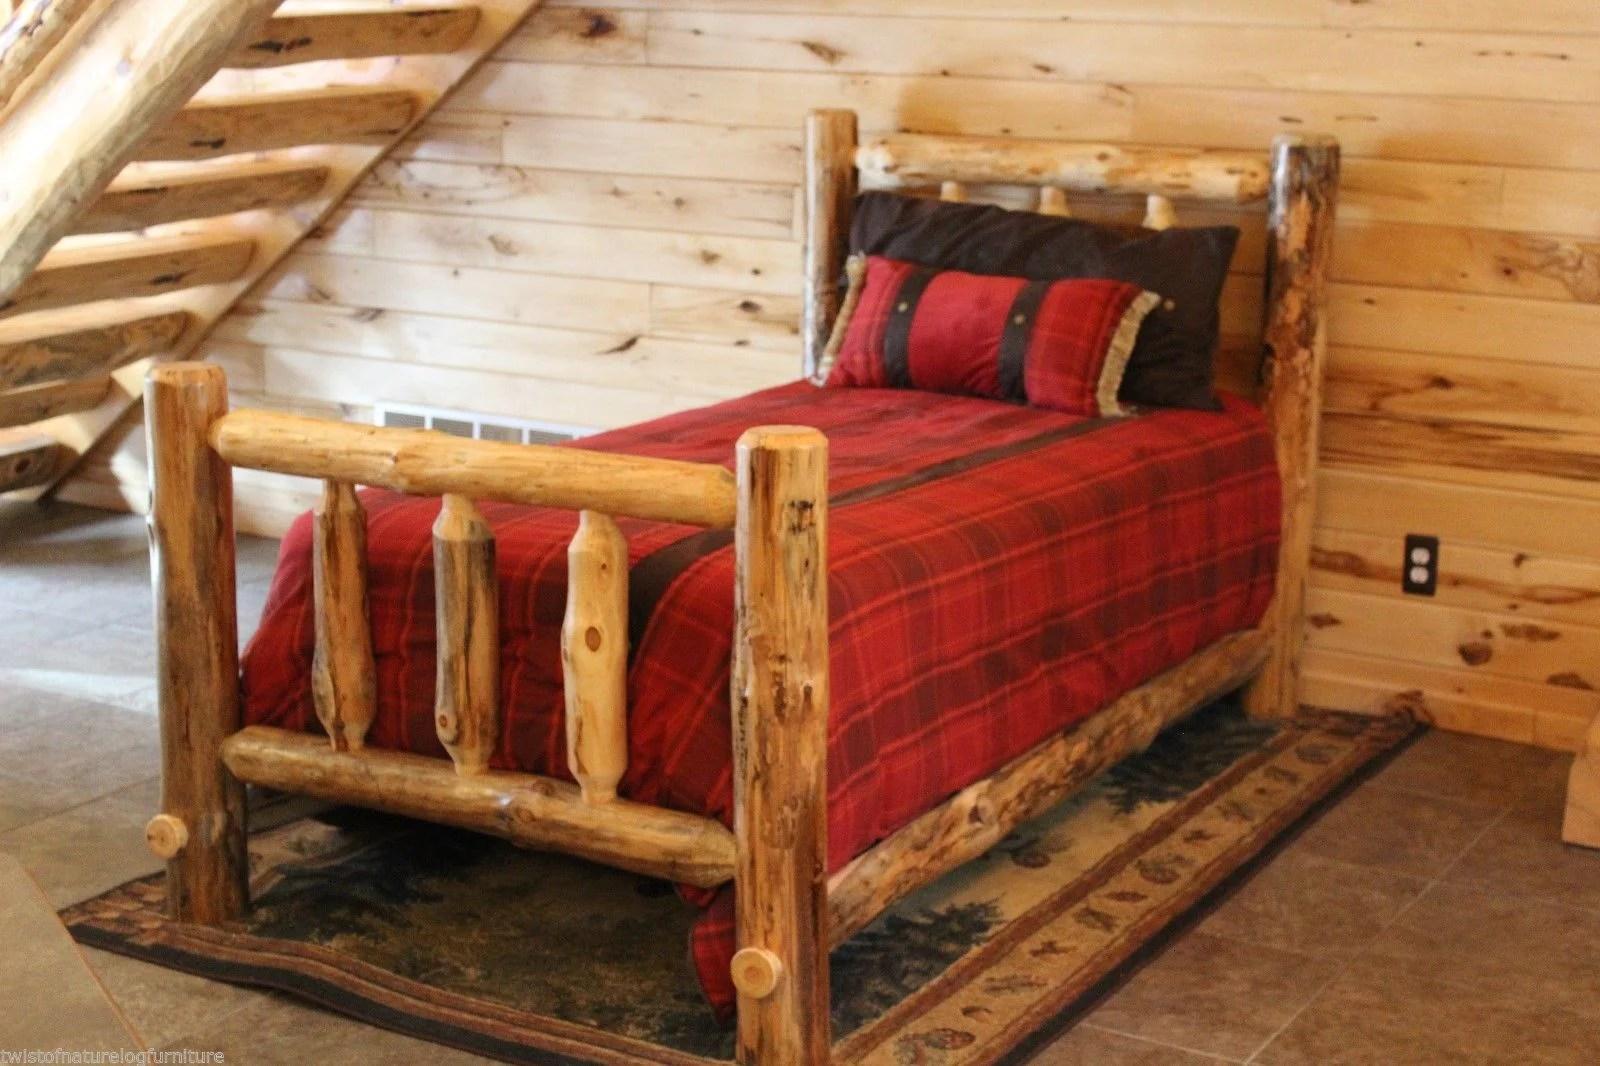 Log Cabin Kit Bed Twistofnature